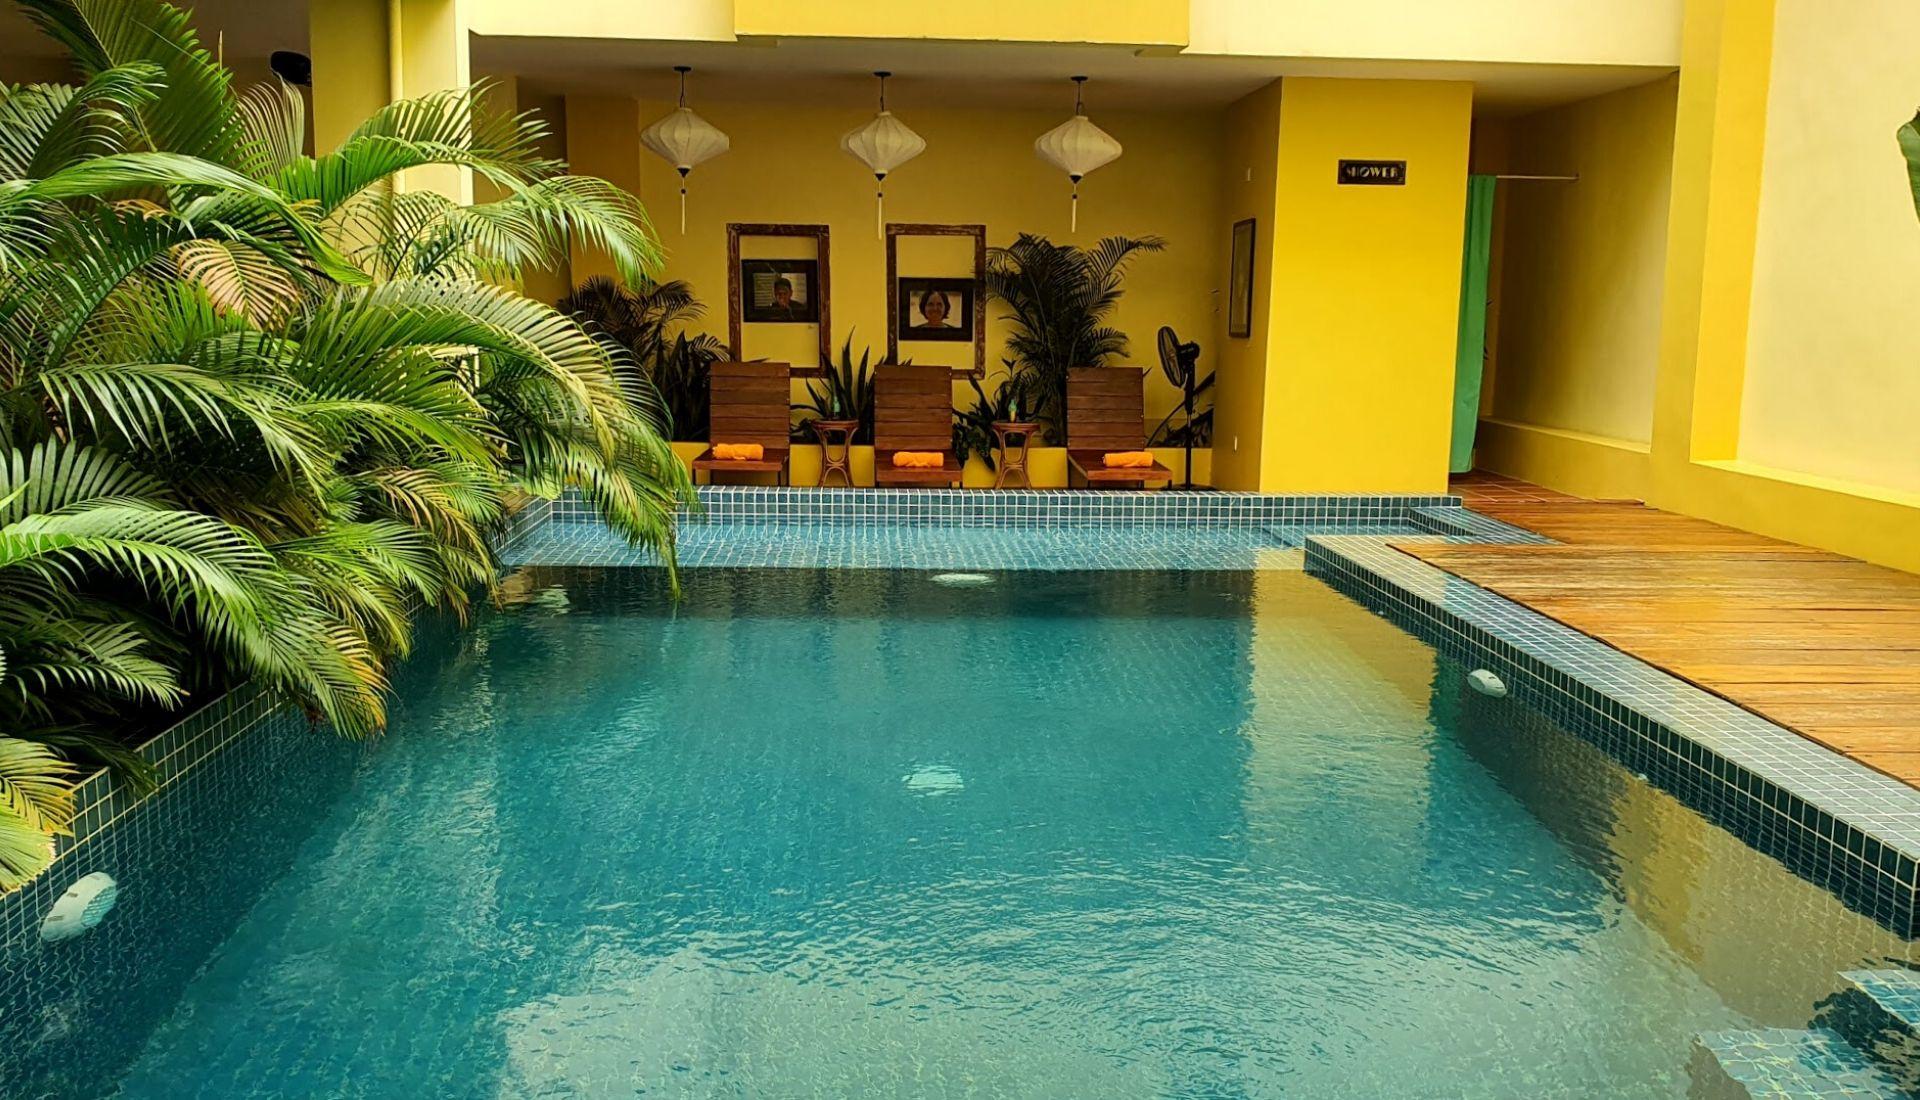 Pool at Old Cinema Hotel Kampot